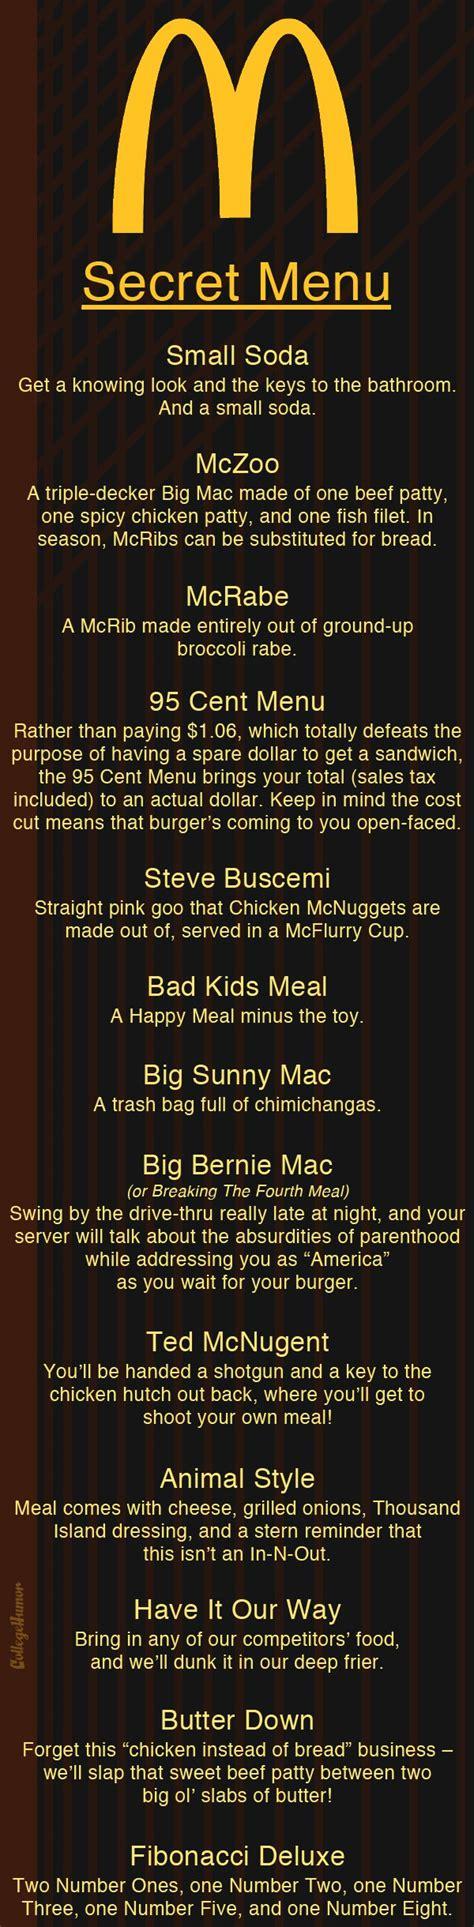 secret menu even more secret menus page 3 collegehumor post